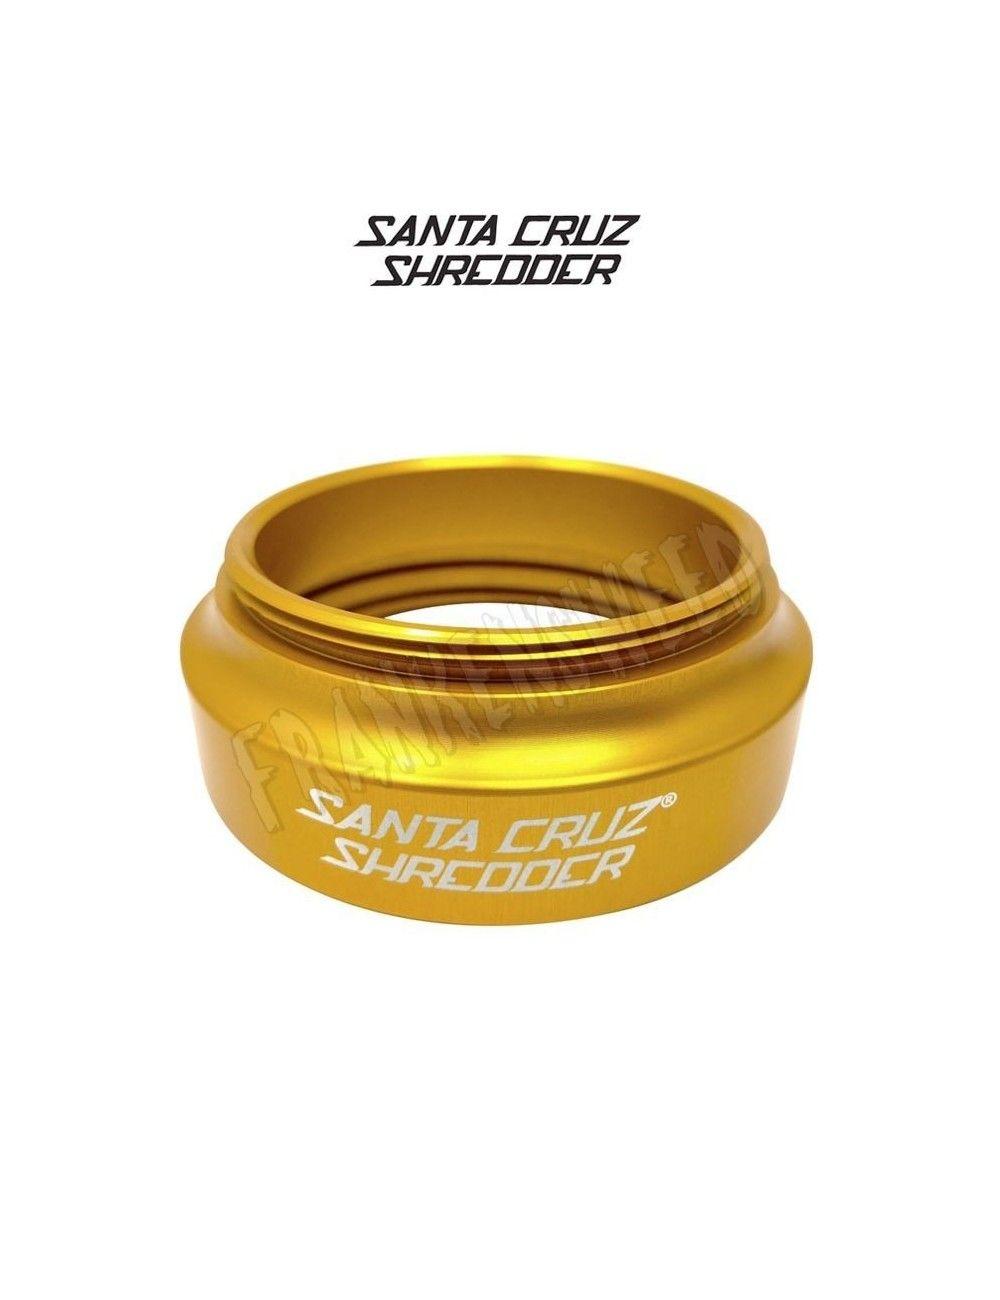 Santa Cruz Shredder Mason Jar Adapter - Gold